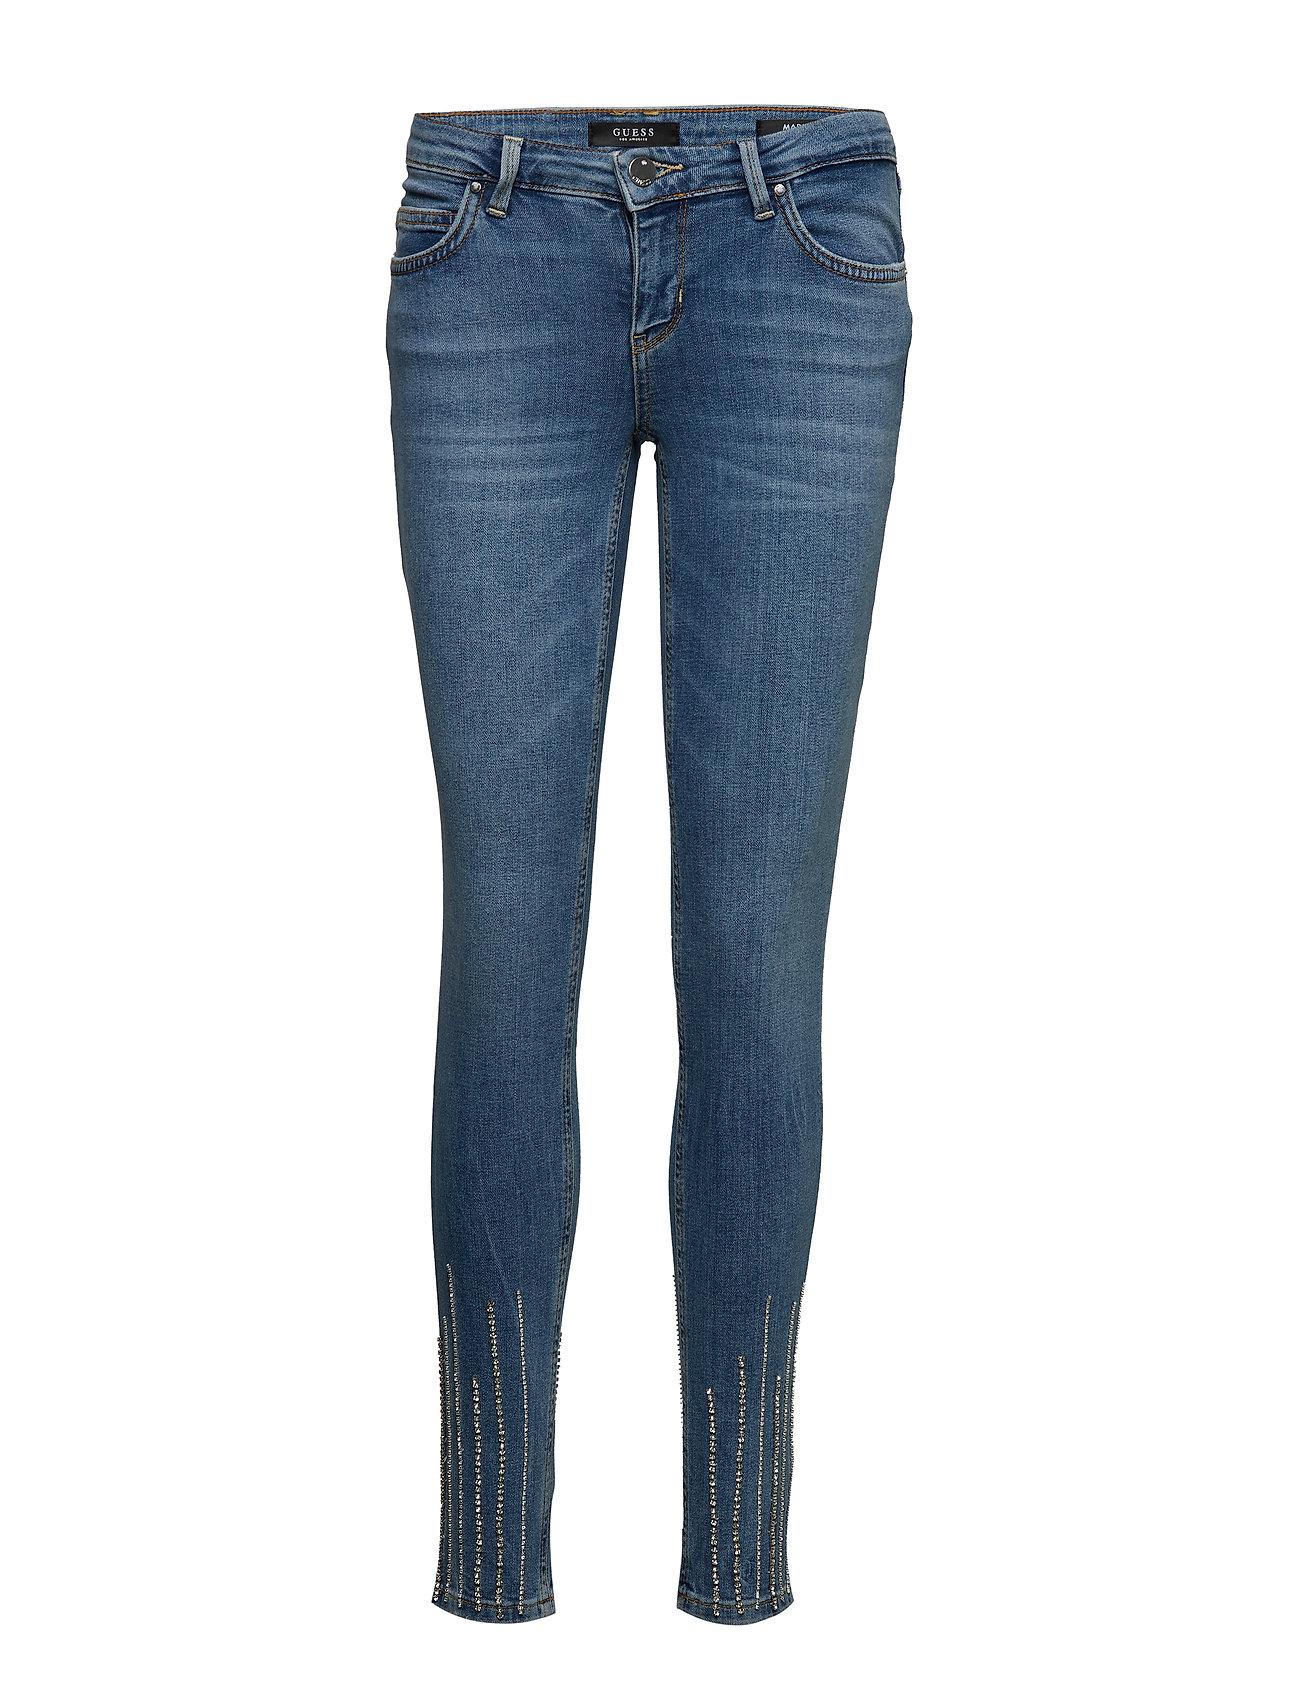 GUESS Jeans MARILYN - BLING BLASTER